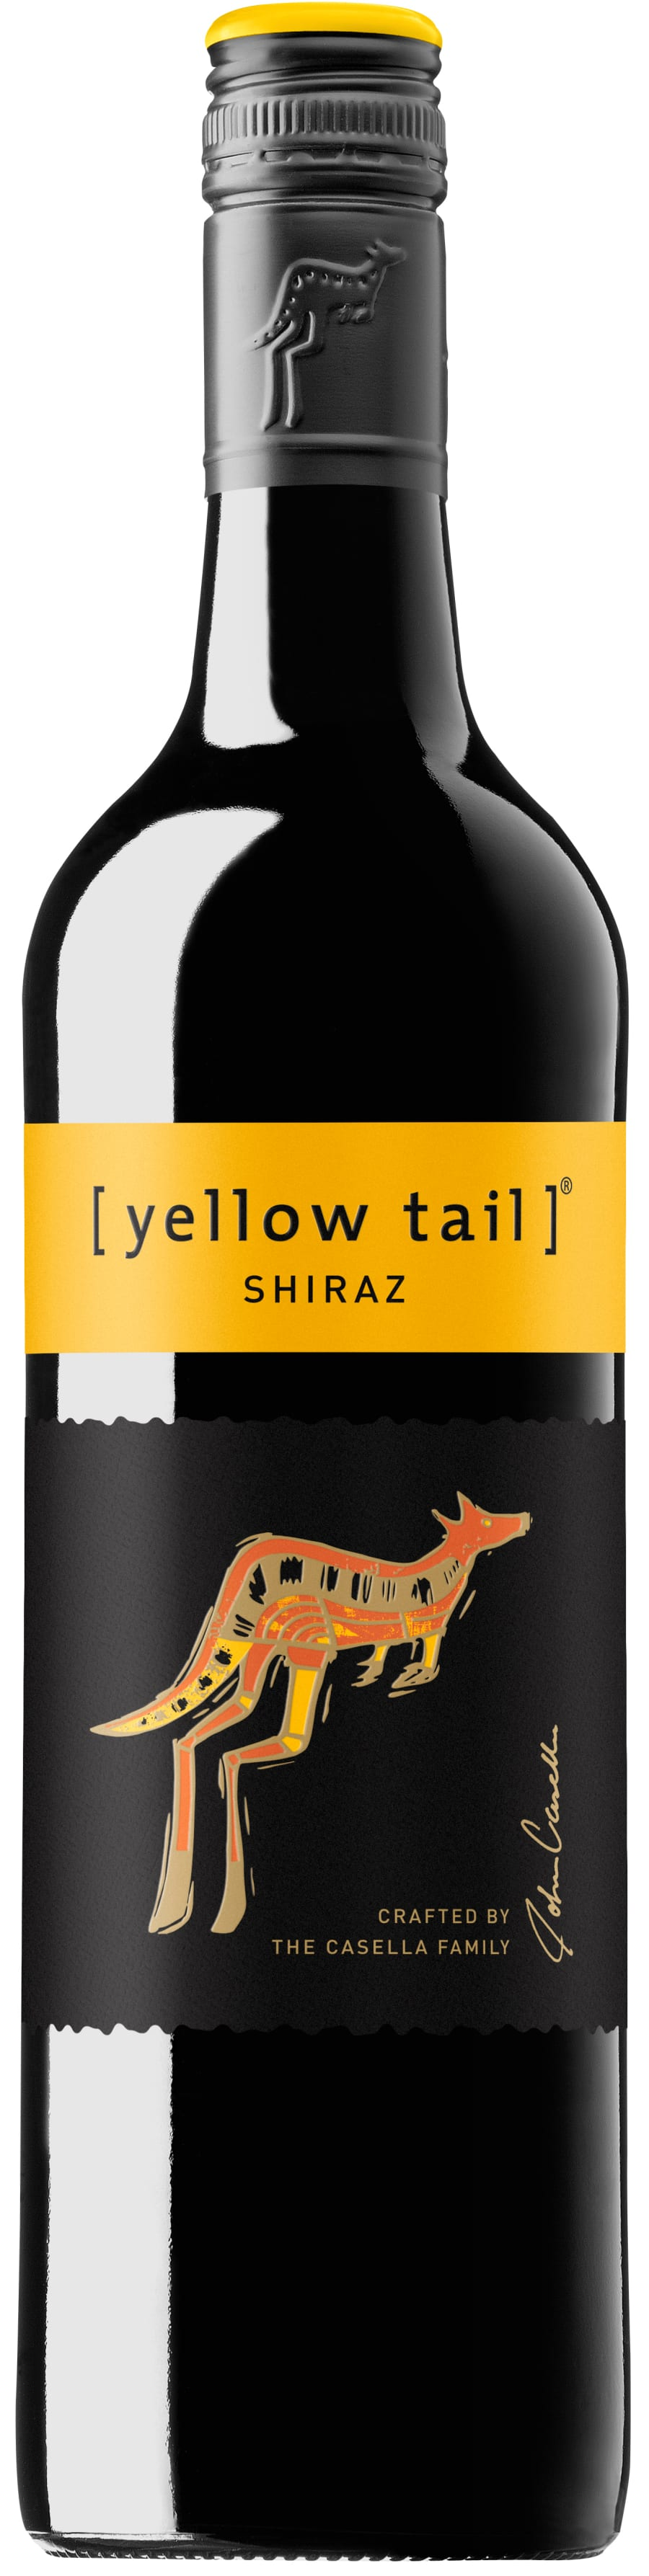 yellow-tail-shiraz-2017